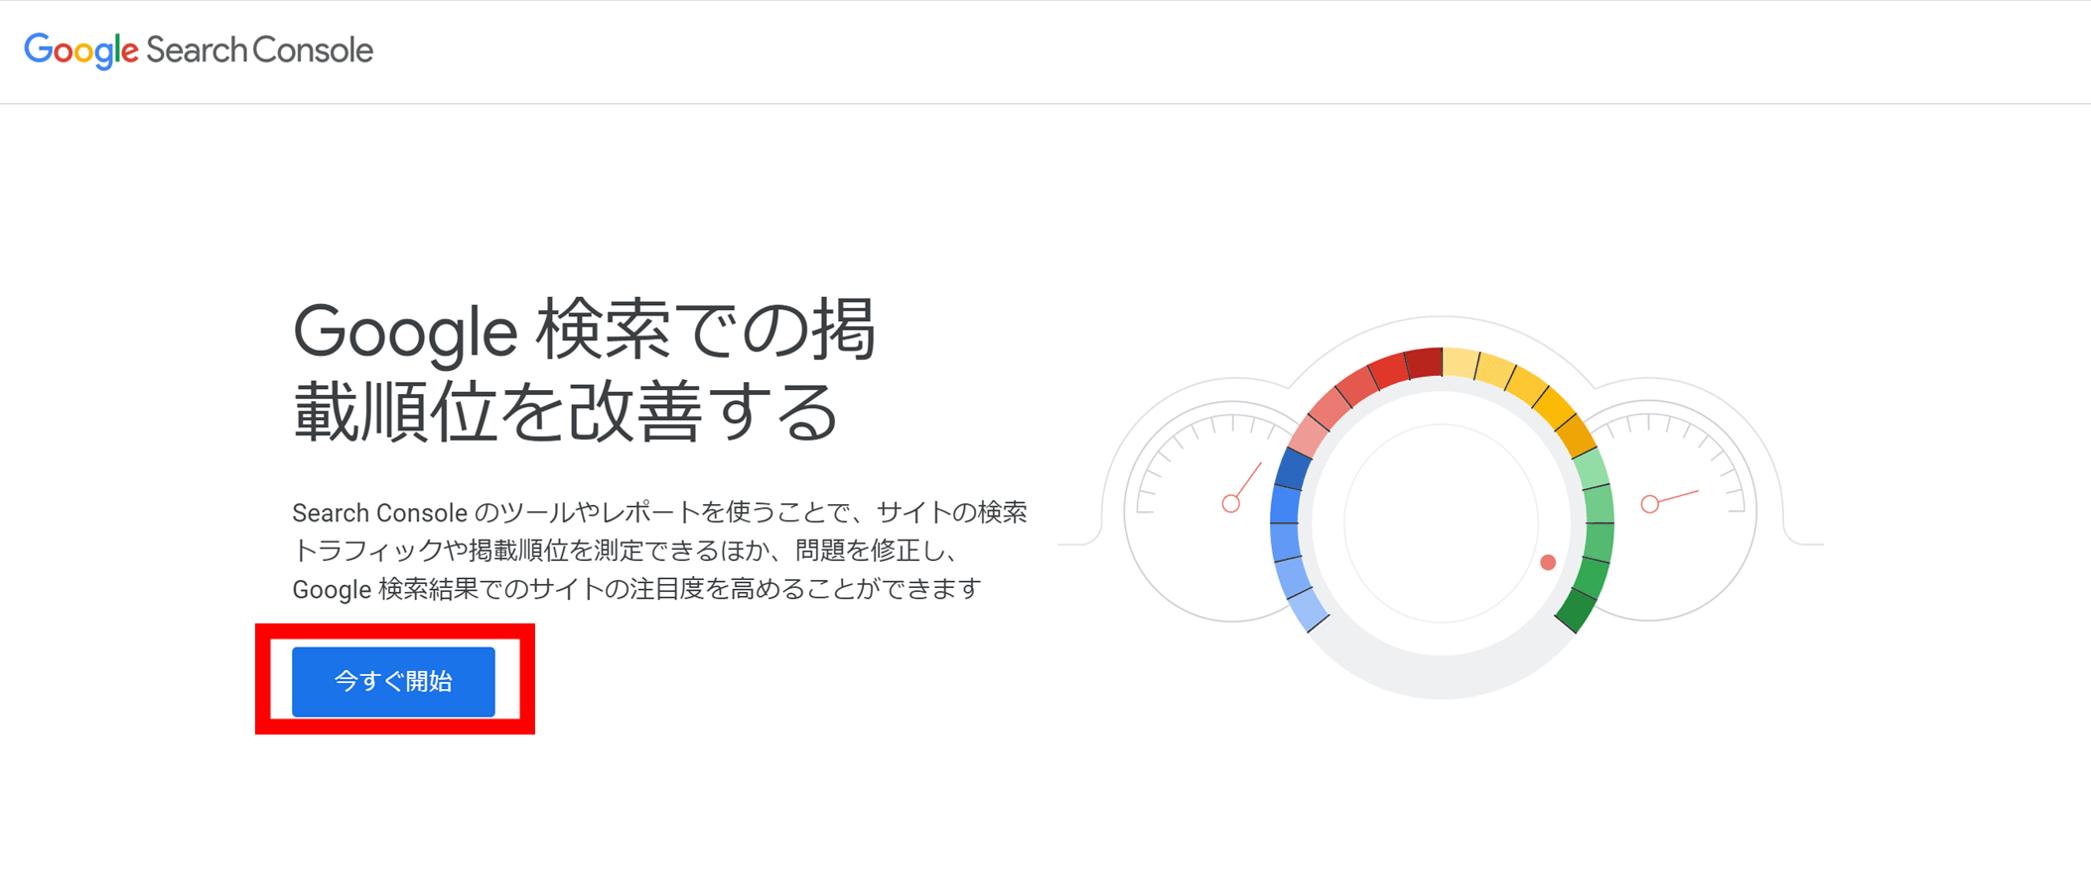 Googleサーチコンソール登録説明